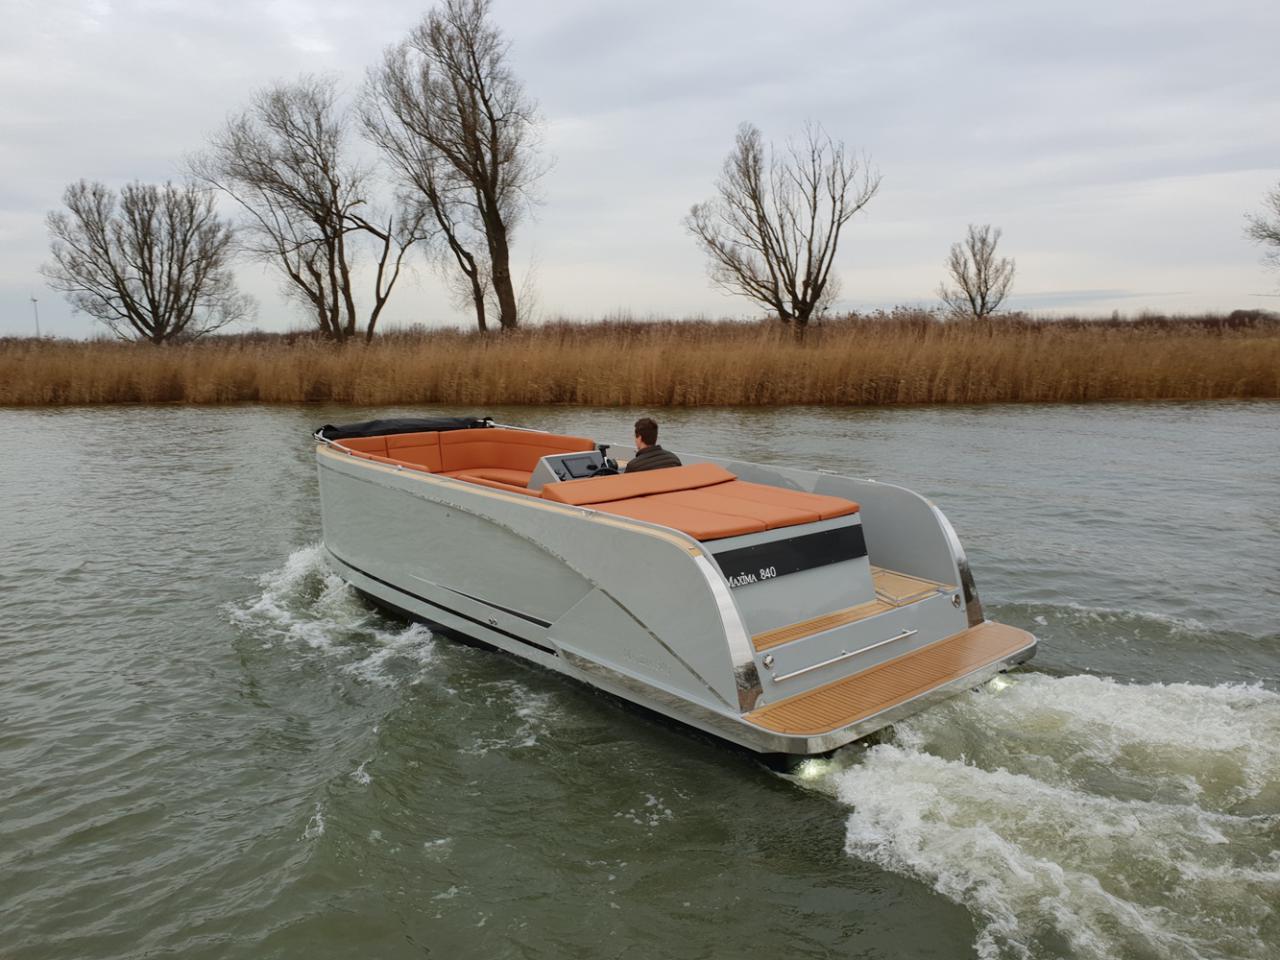 Maxima 840 tender 56